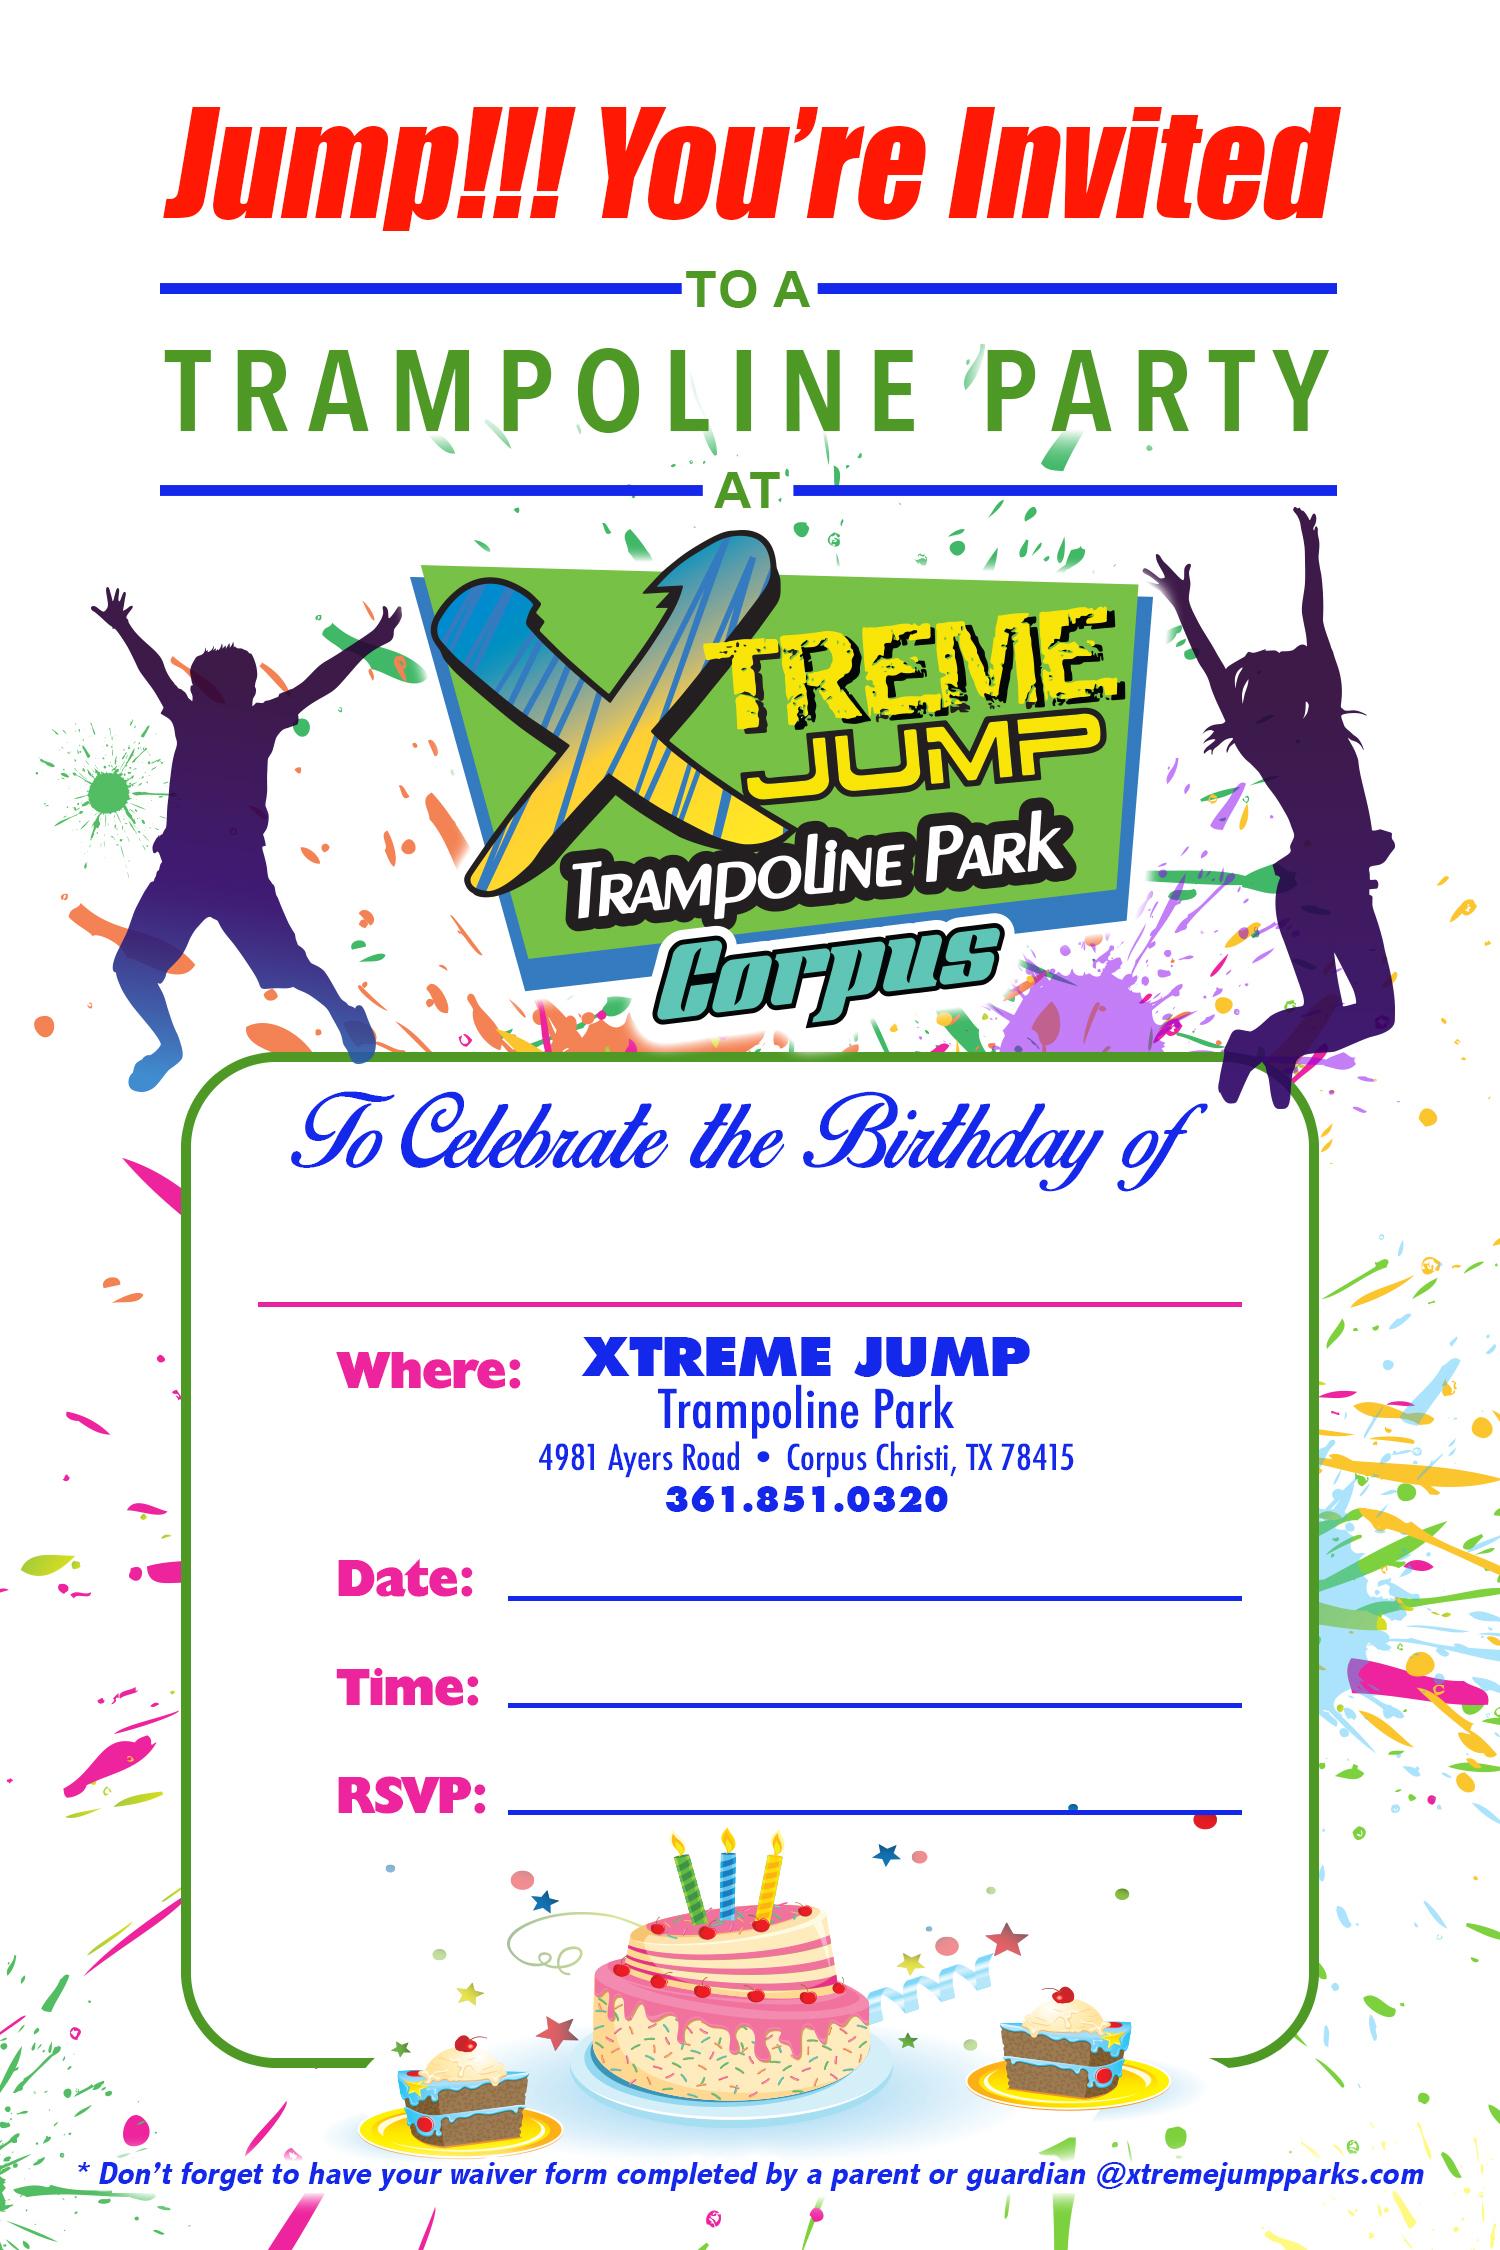 Corpus Christi Party Xtreme Jump